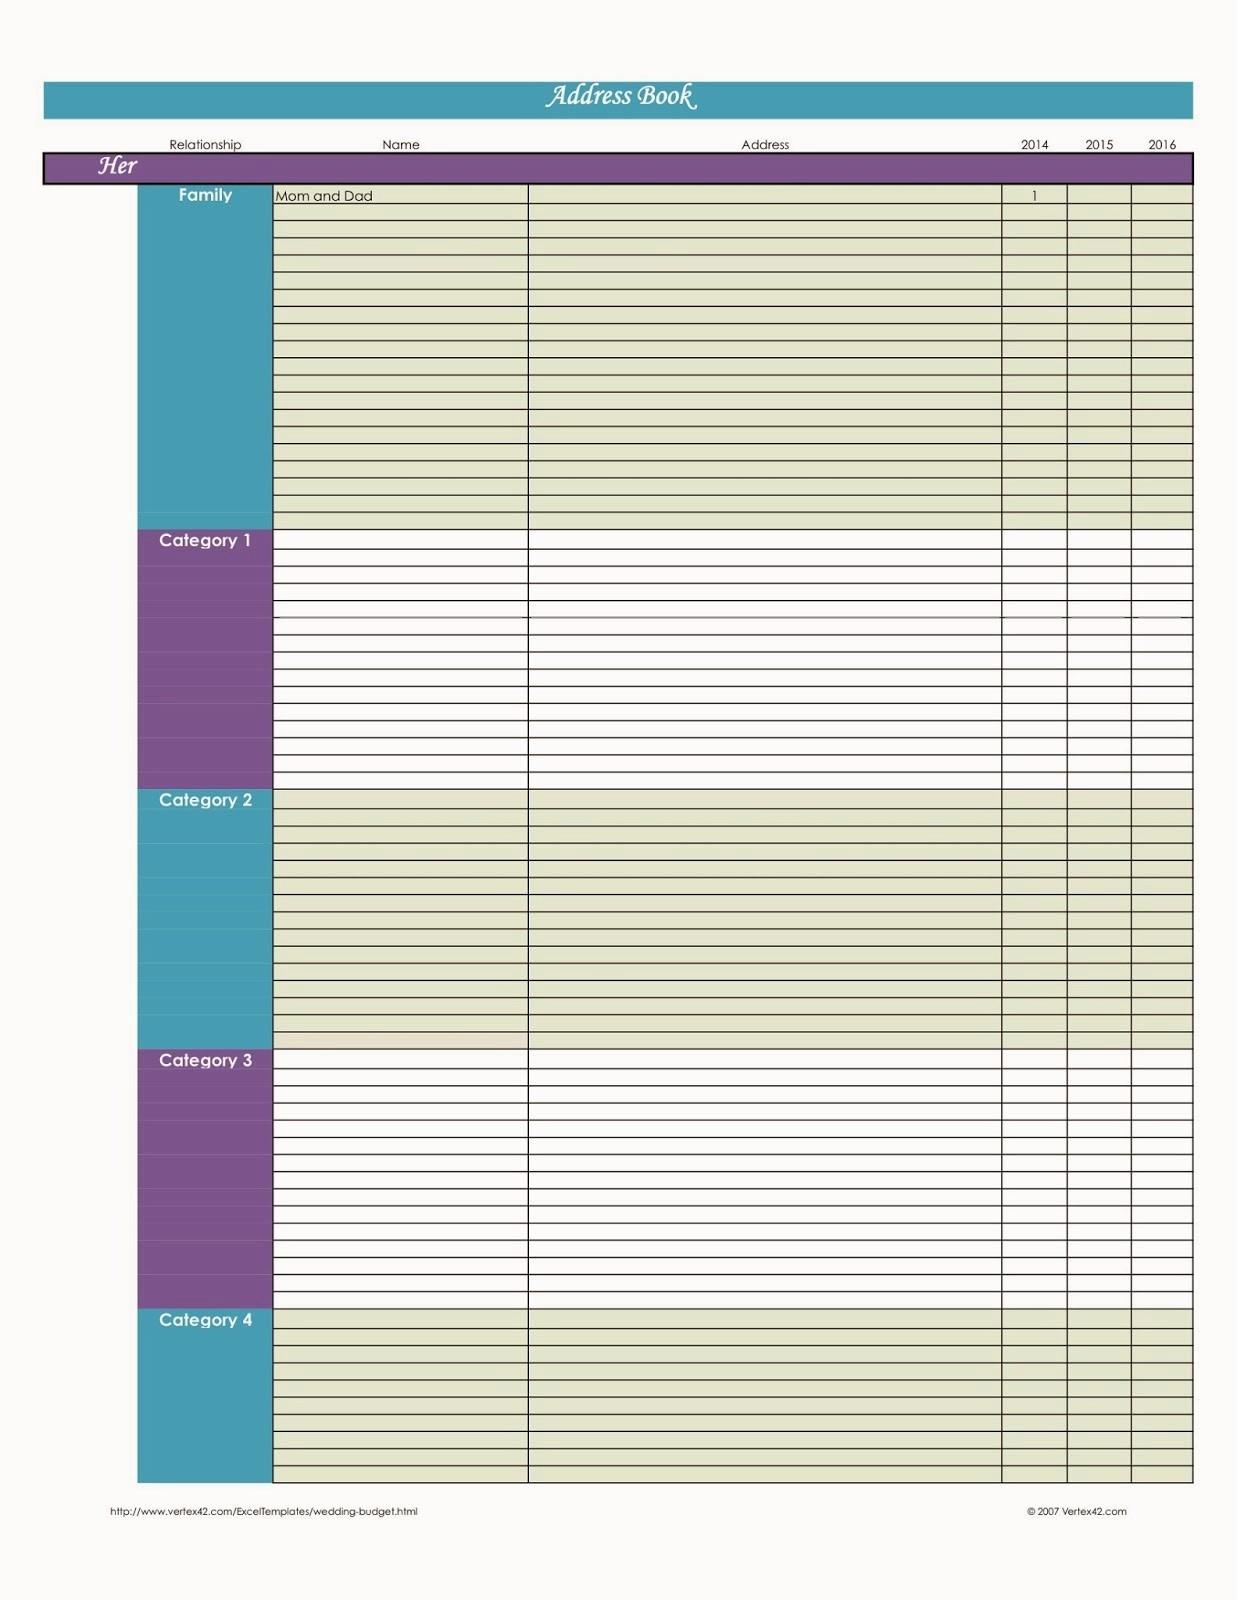 Microsoft Excel Address Book Template Elegant Laura S Plans Easy Excel Address Book Template